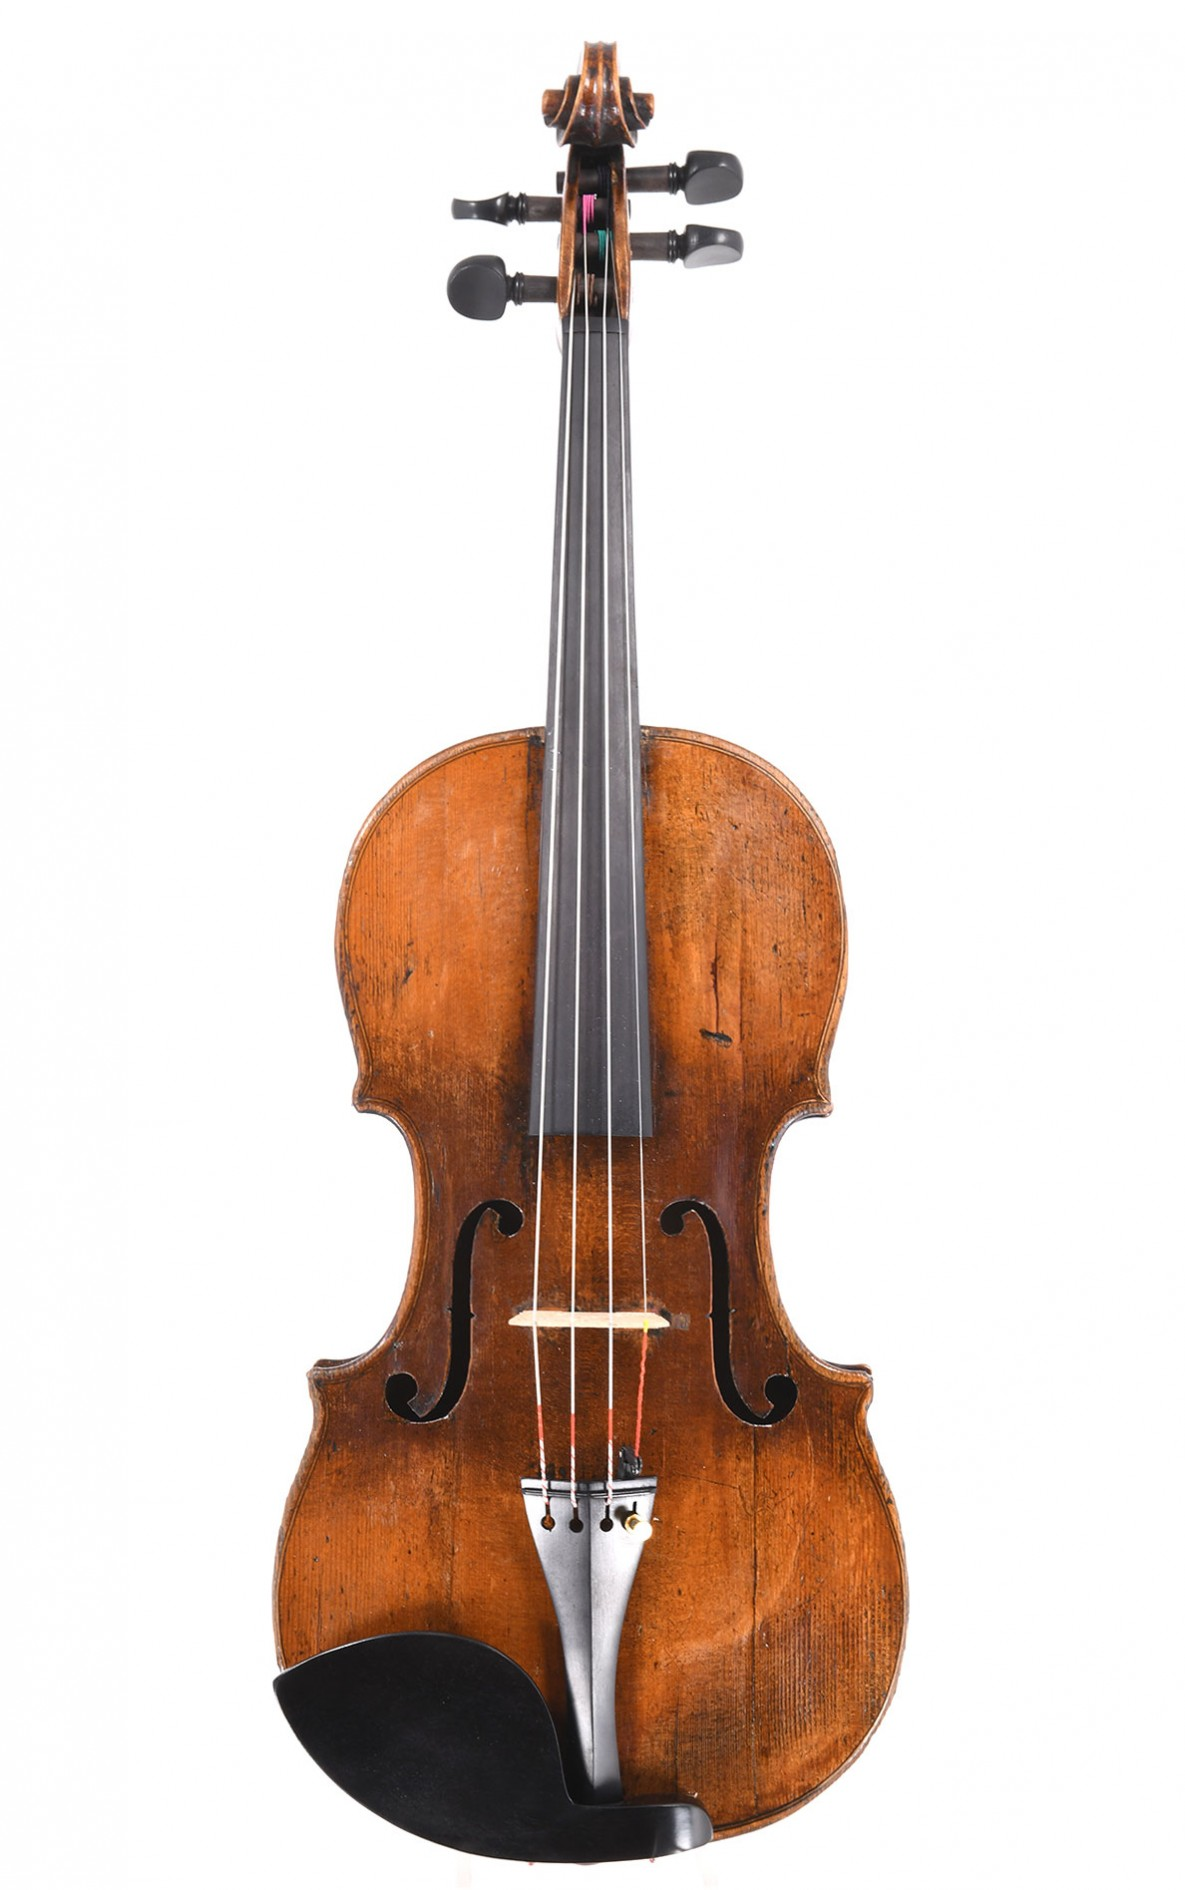 Le Marquis de lair: Violine von Charles Claudot um 1850